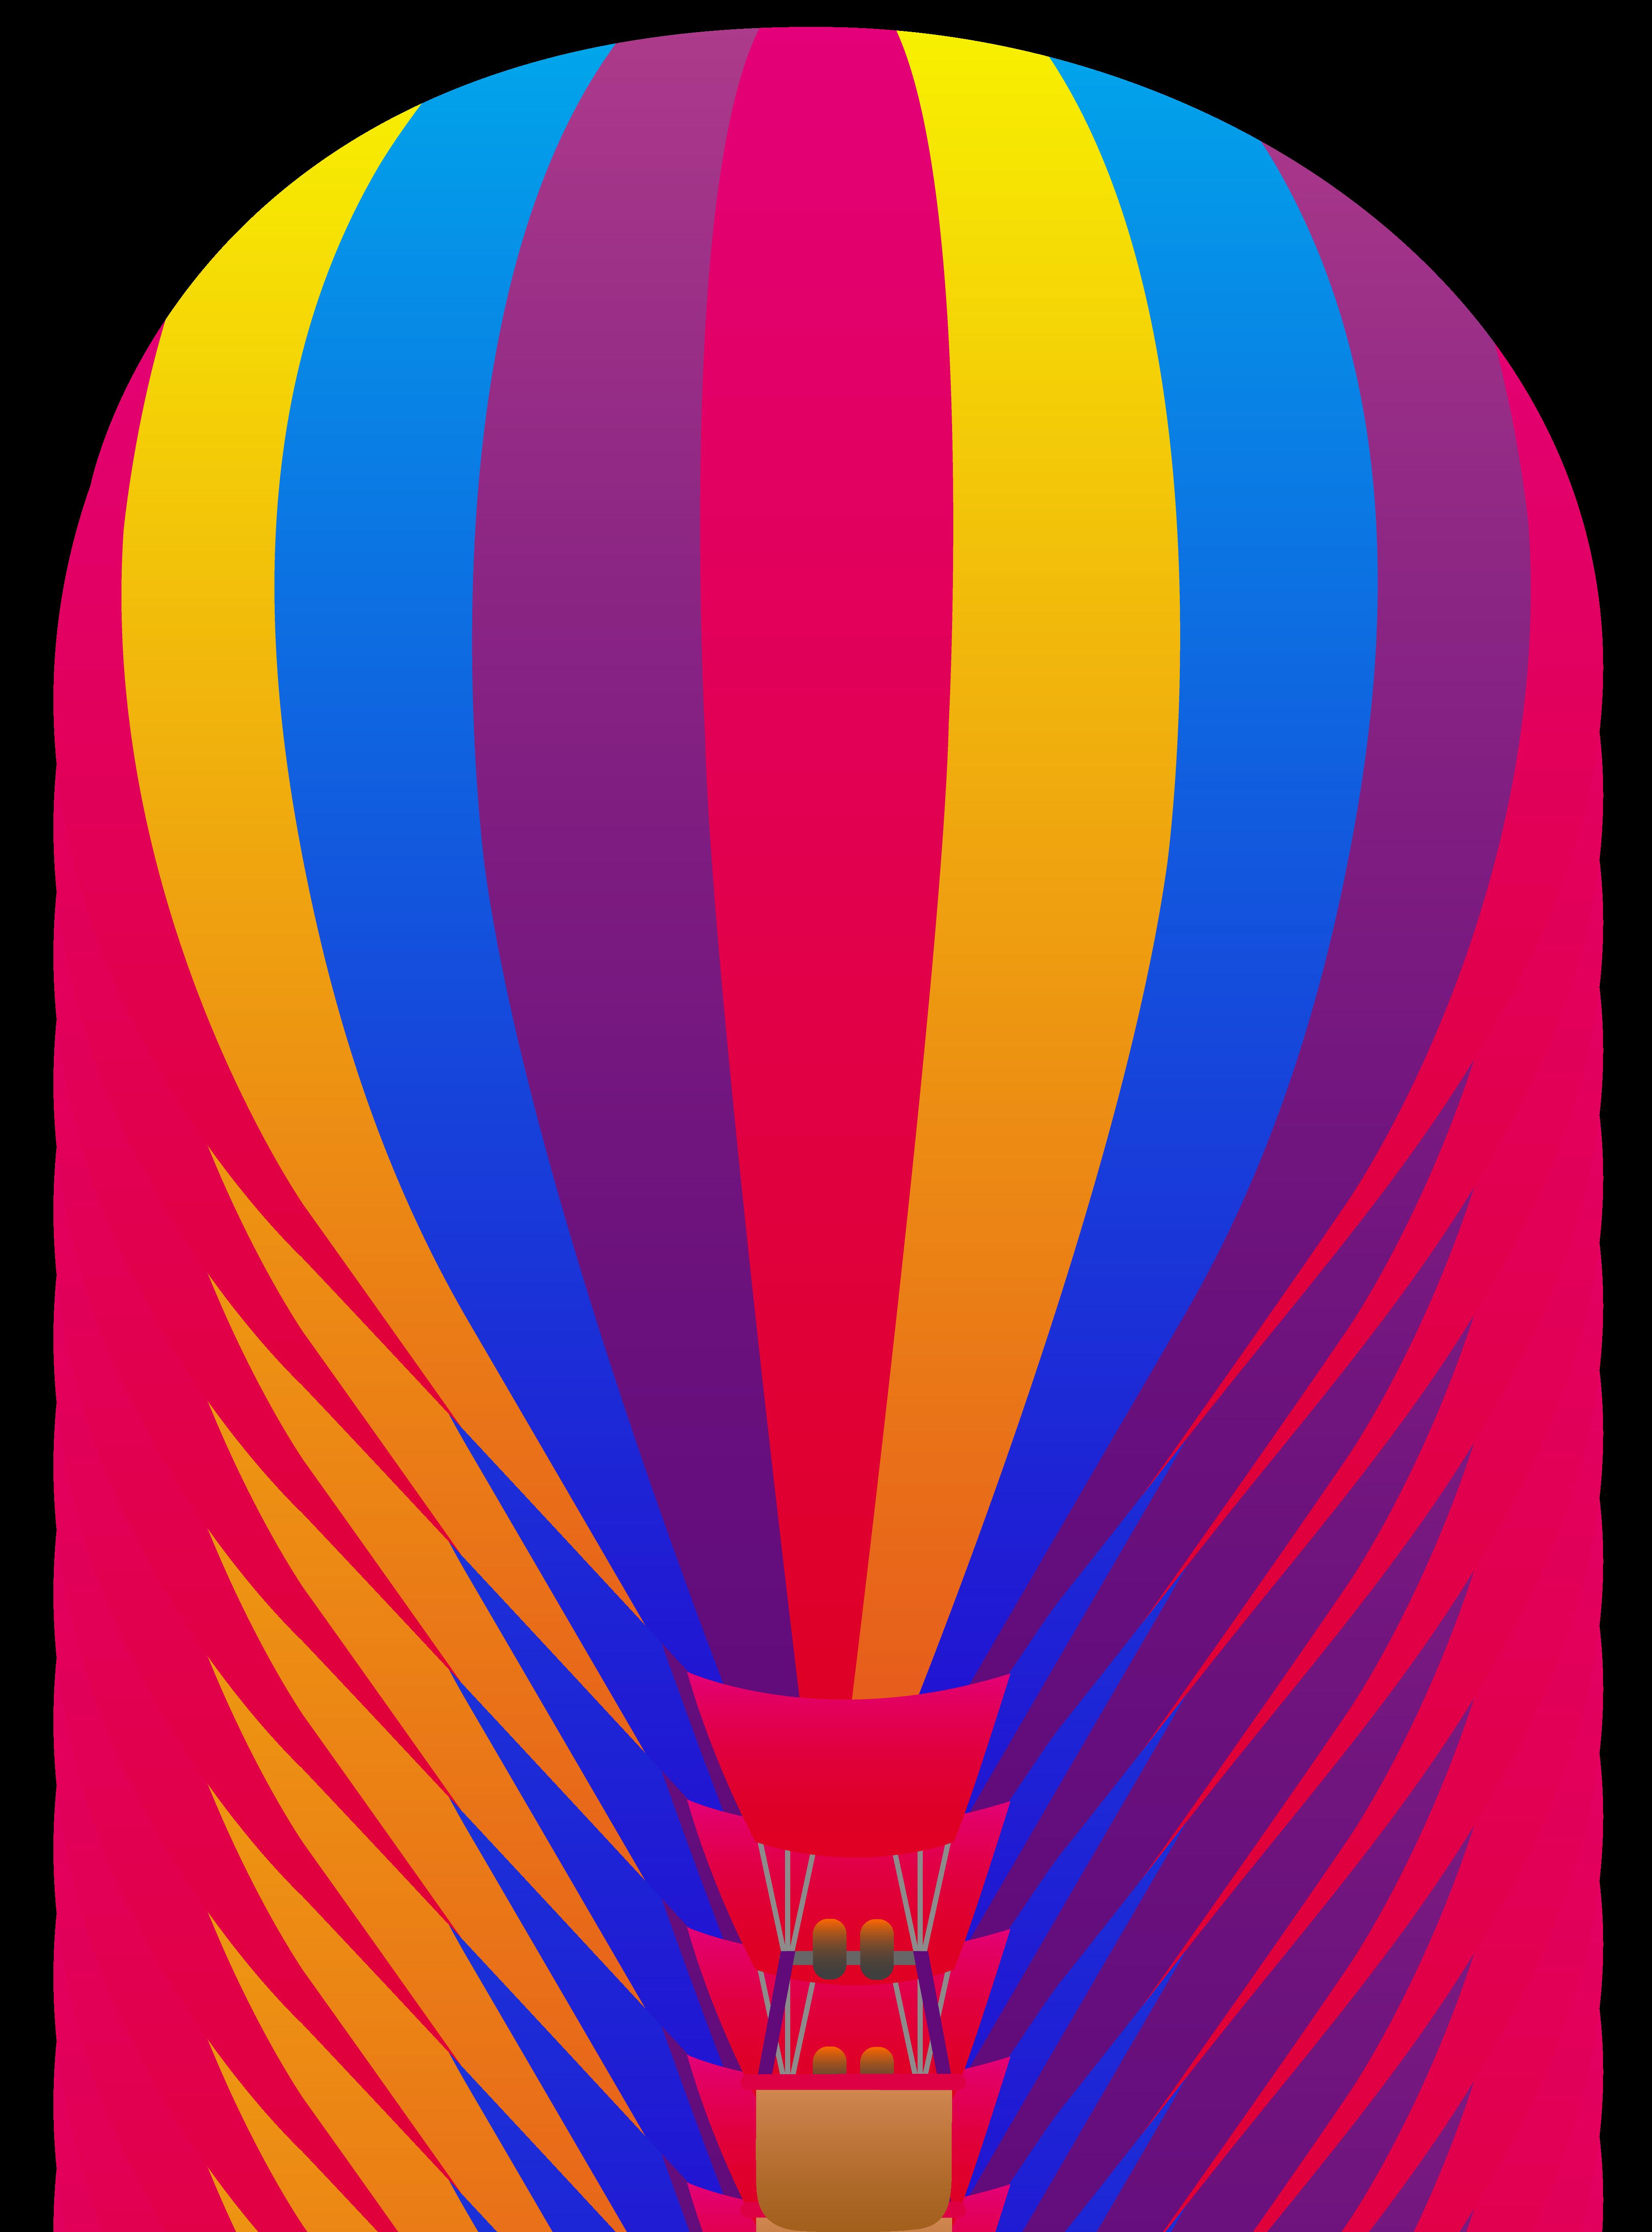 Hot Air Balloon Clip Art - Hot Air Balloon Clip Art